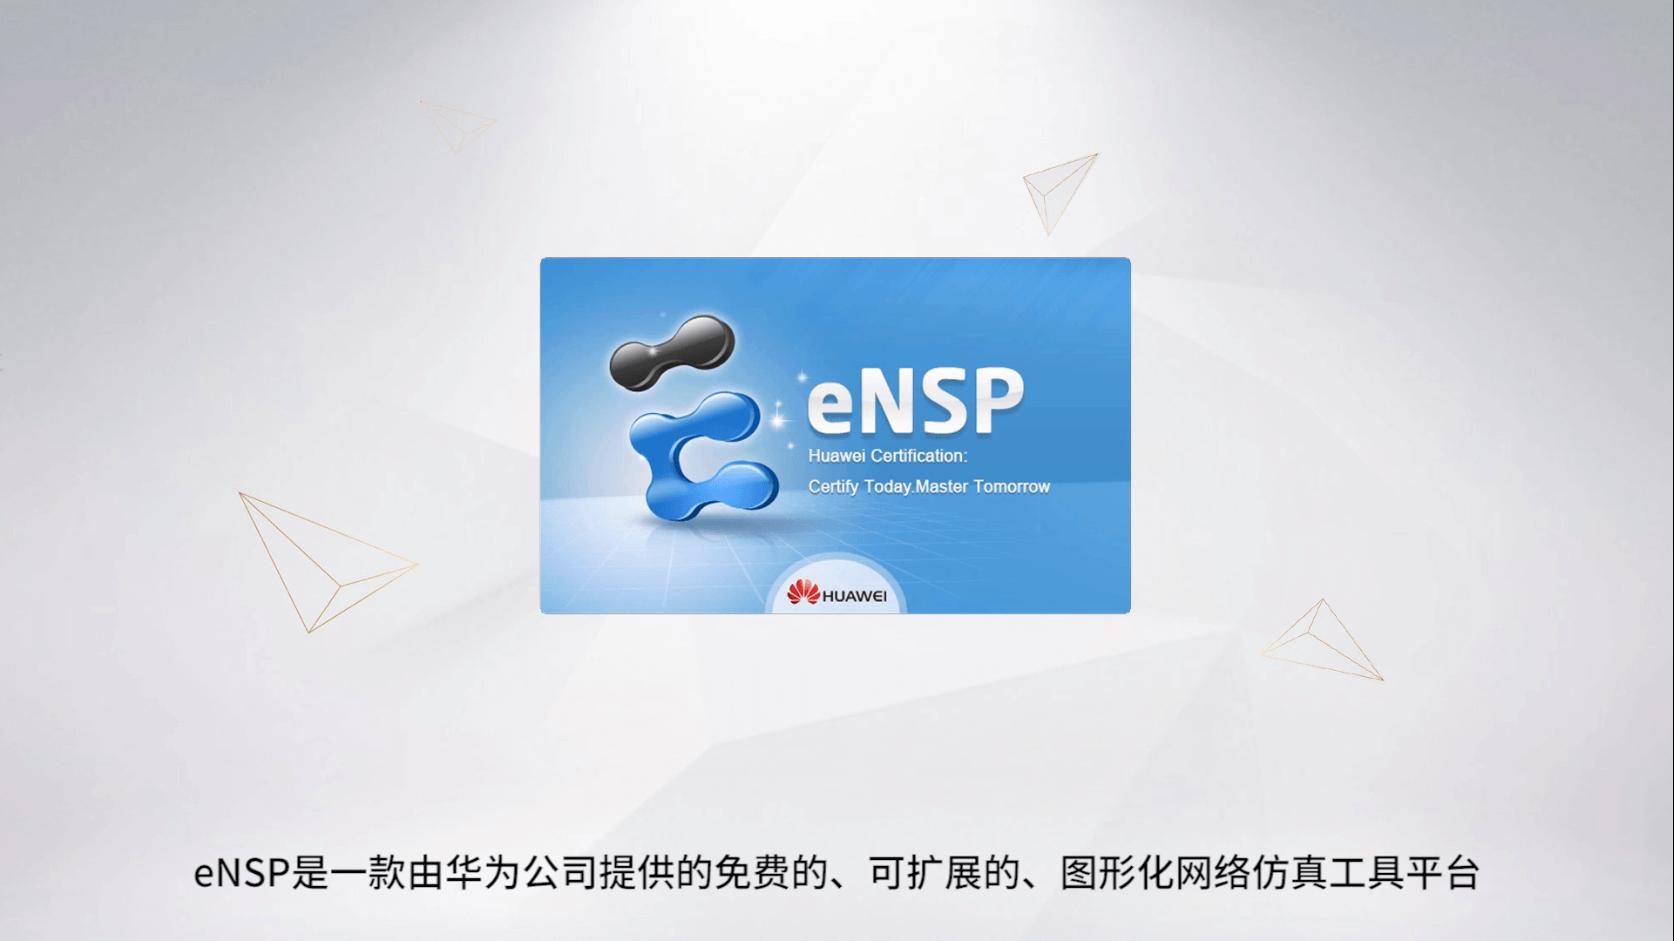 eNSP 模拟器下载-59学习网